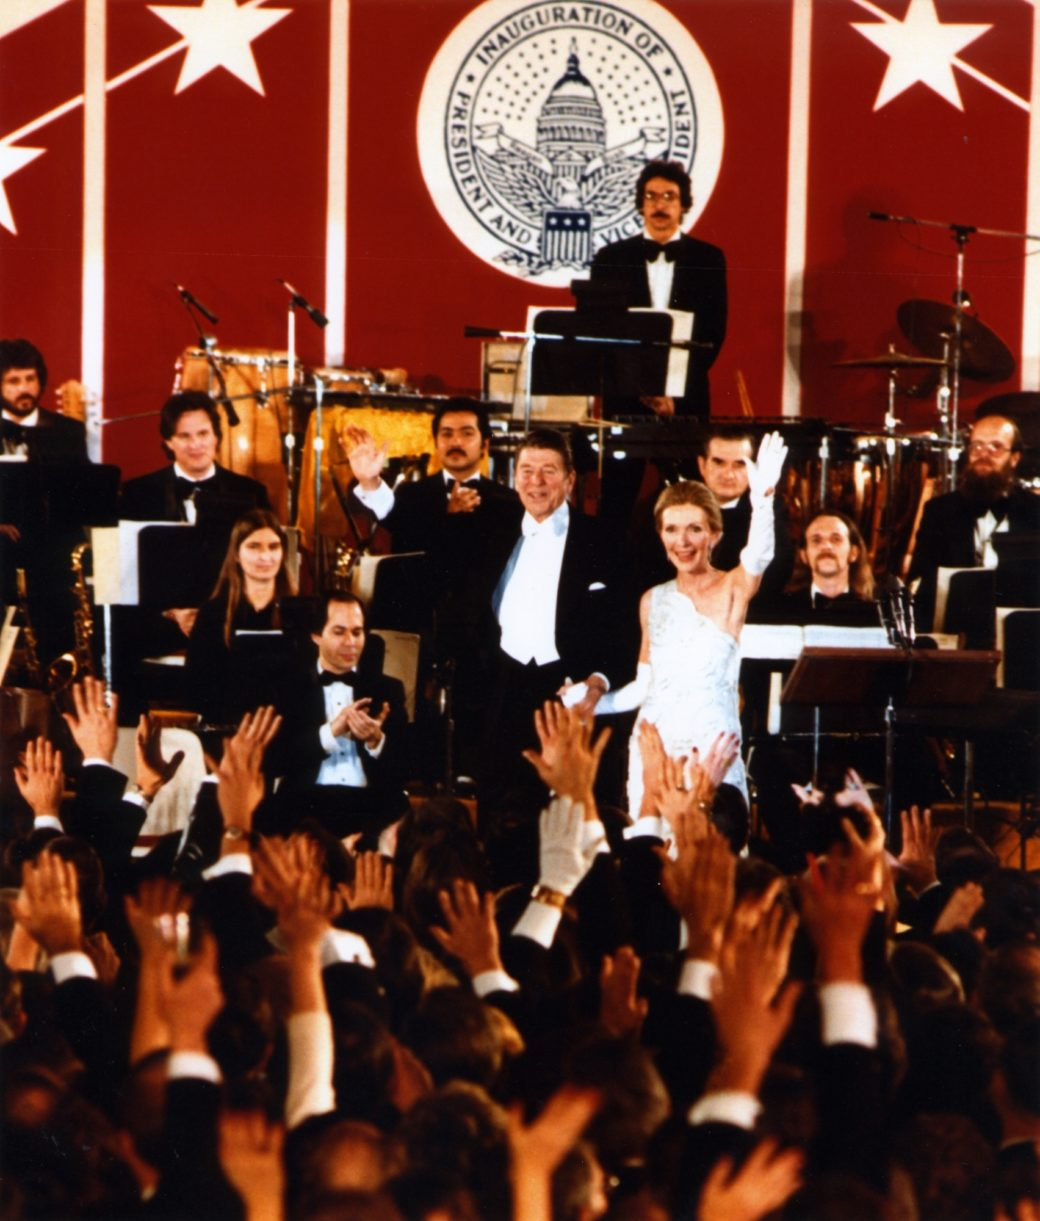 Ronald Reagan Inauguration 1985